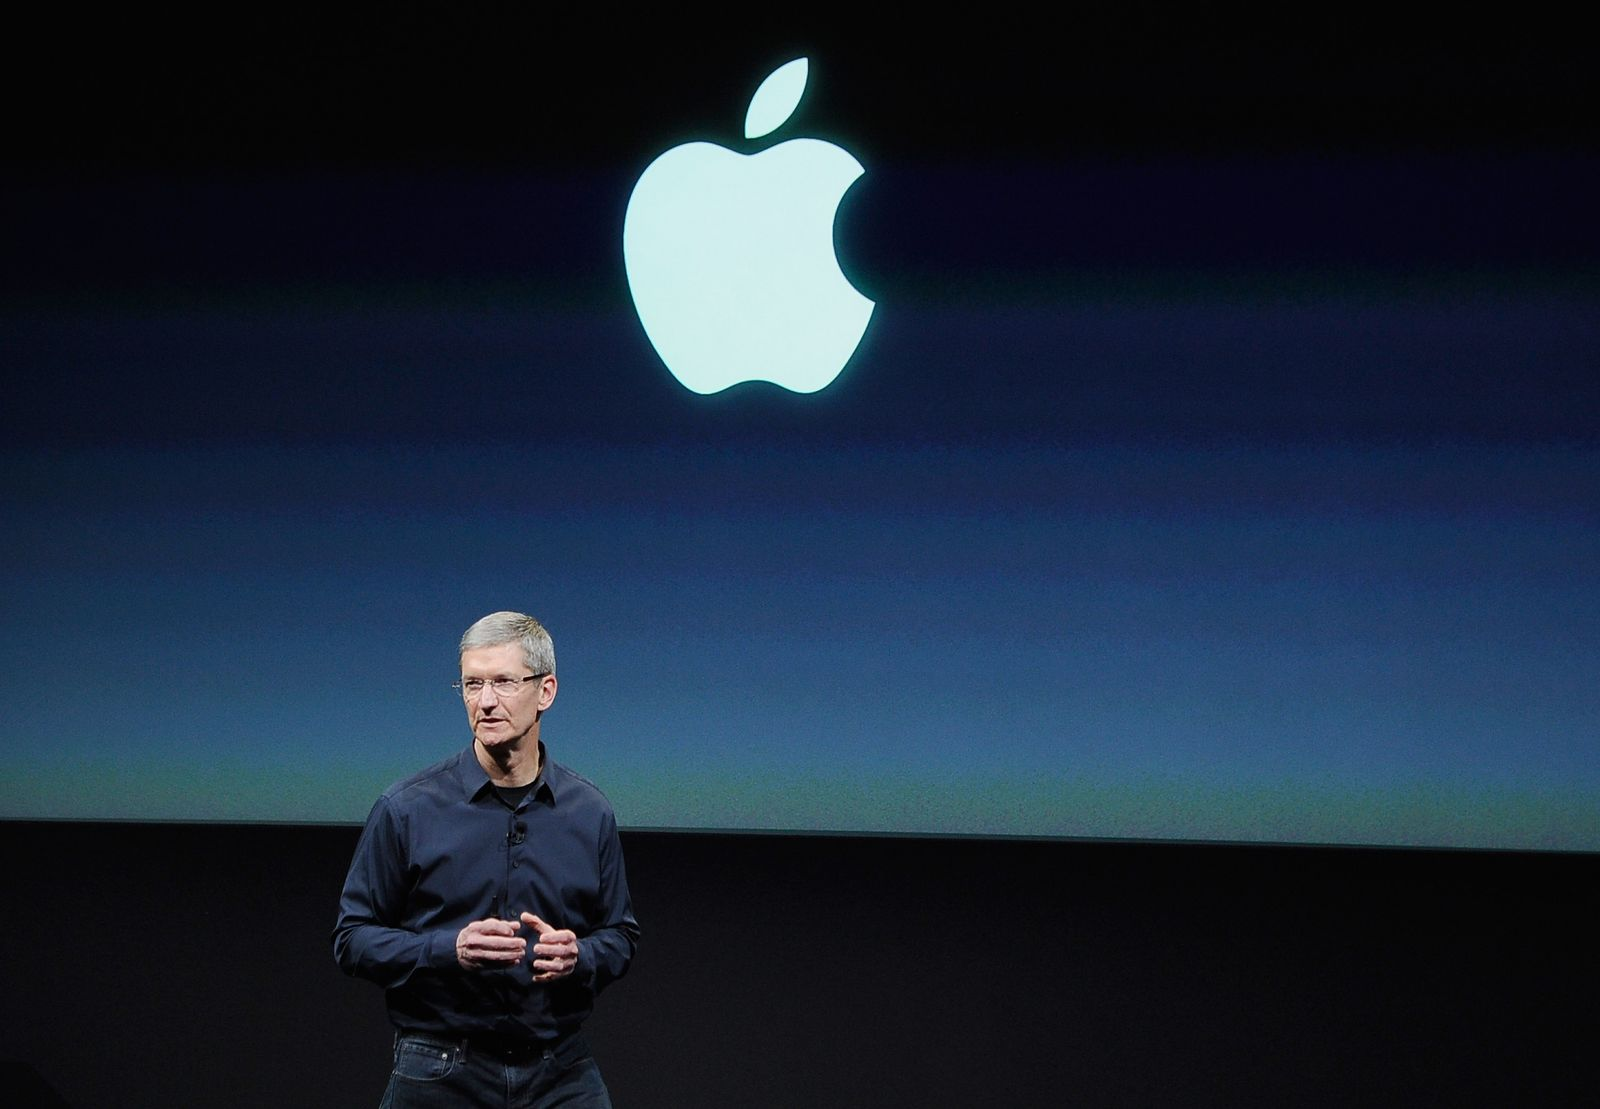 cook/ Apple/ iPhone 5